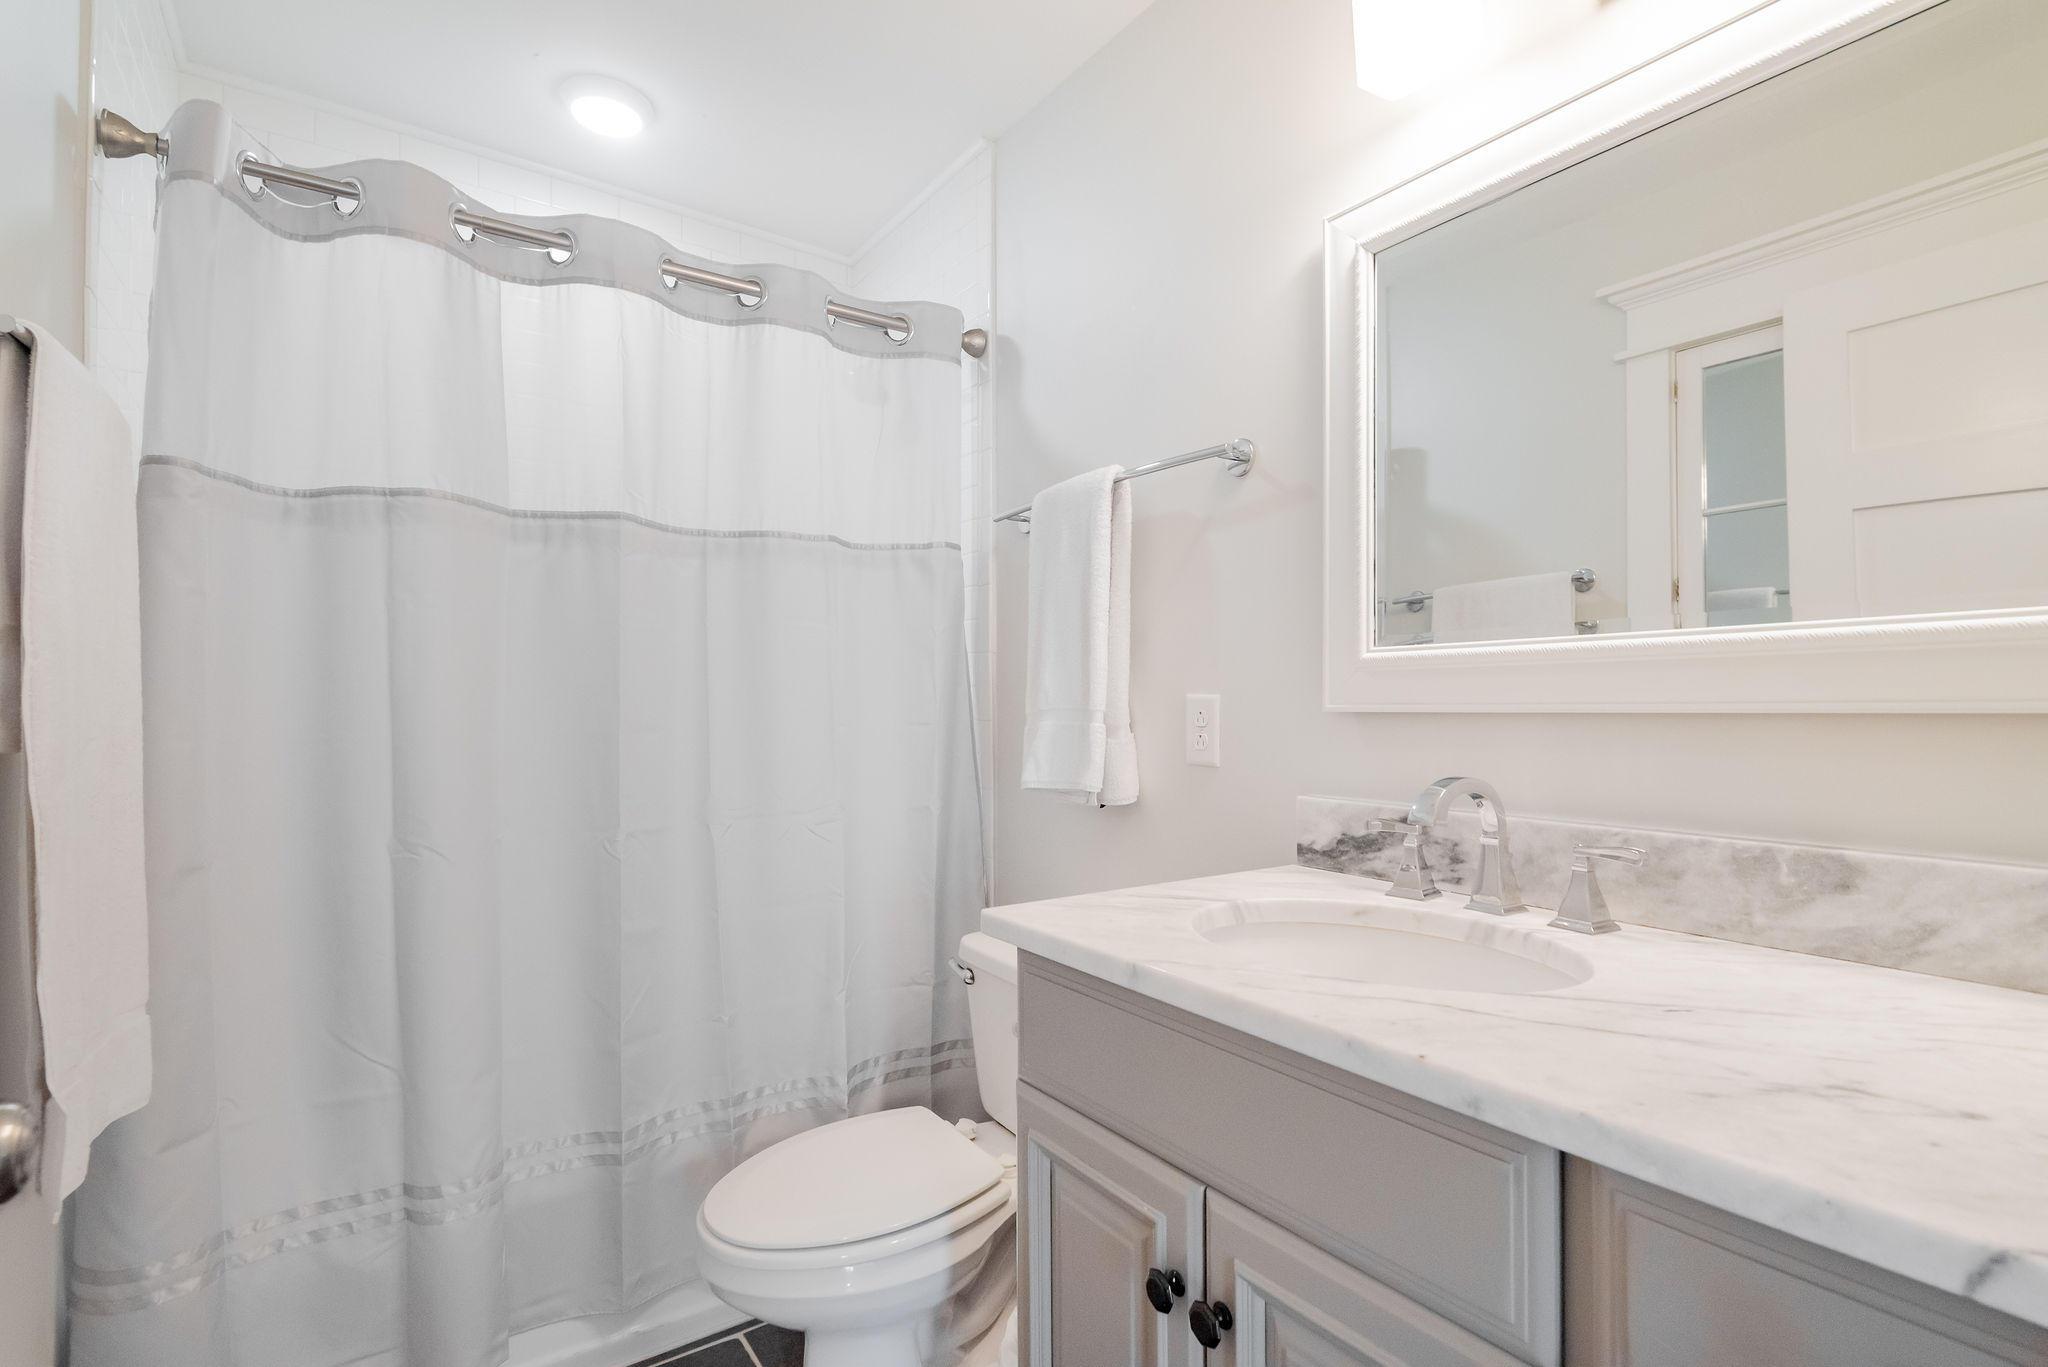 Elliotborough Homes For Sale - 29 Sires, Charleston, SC - 4